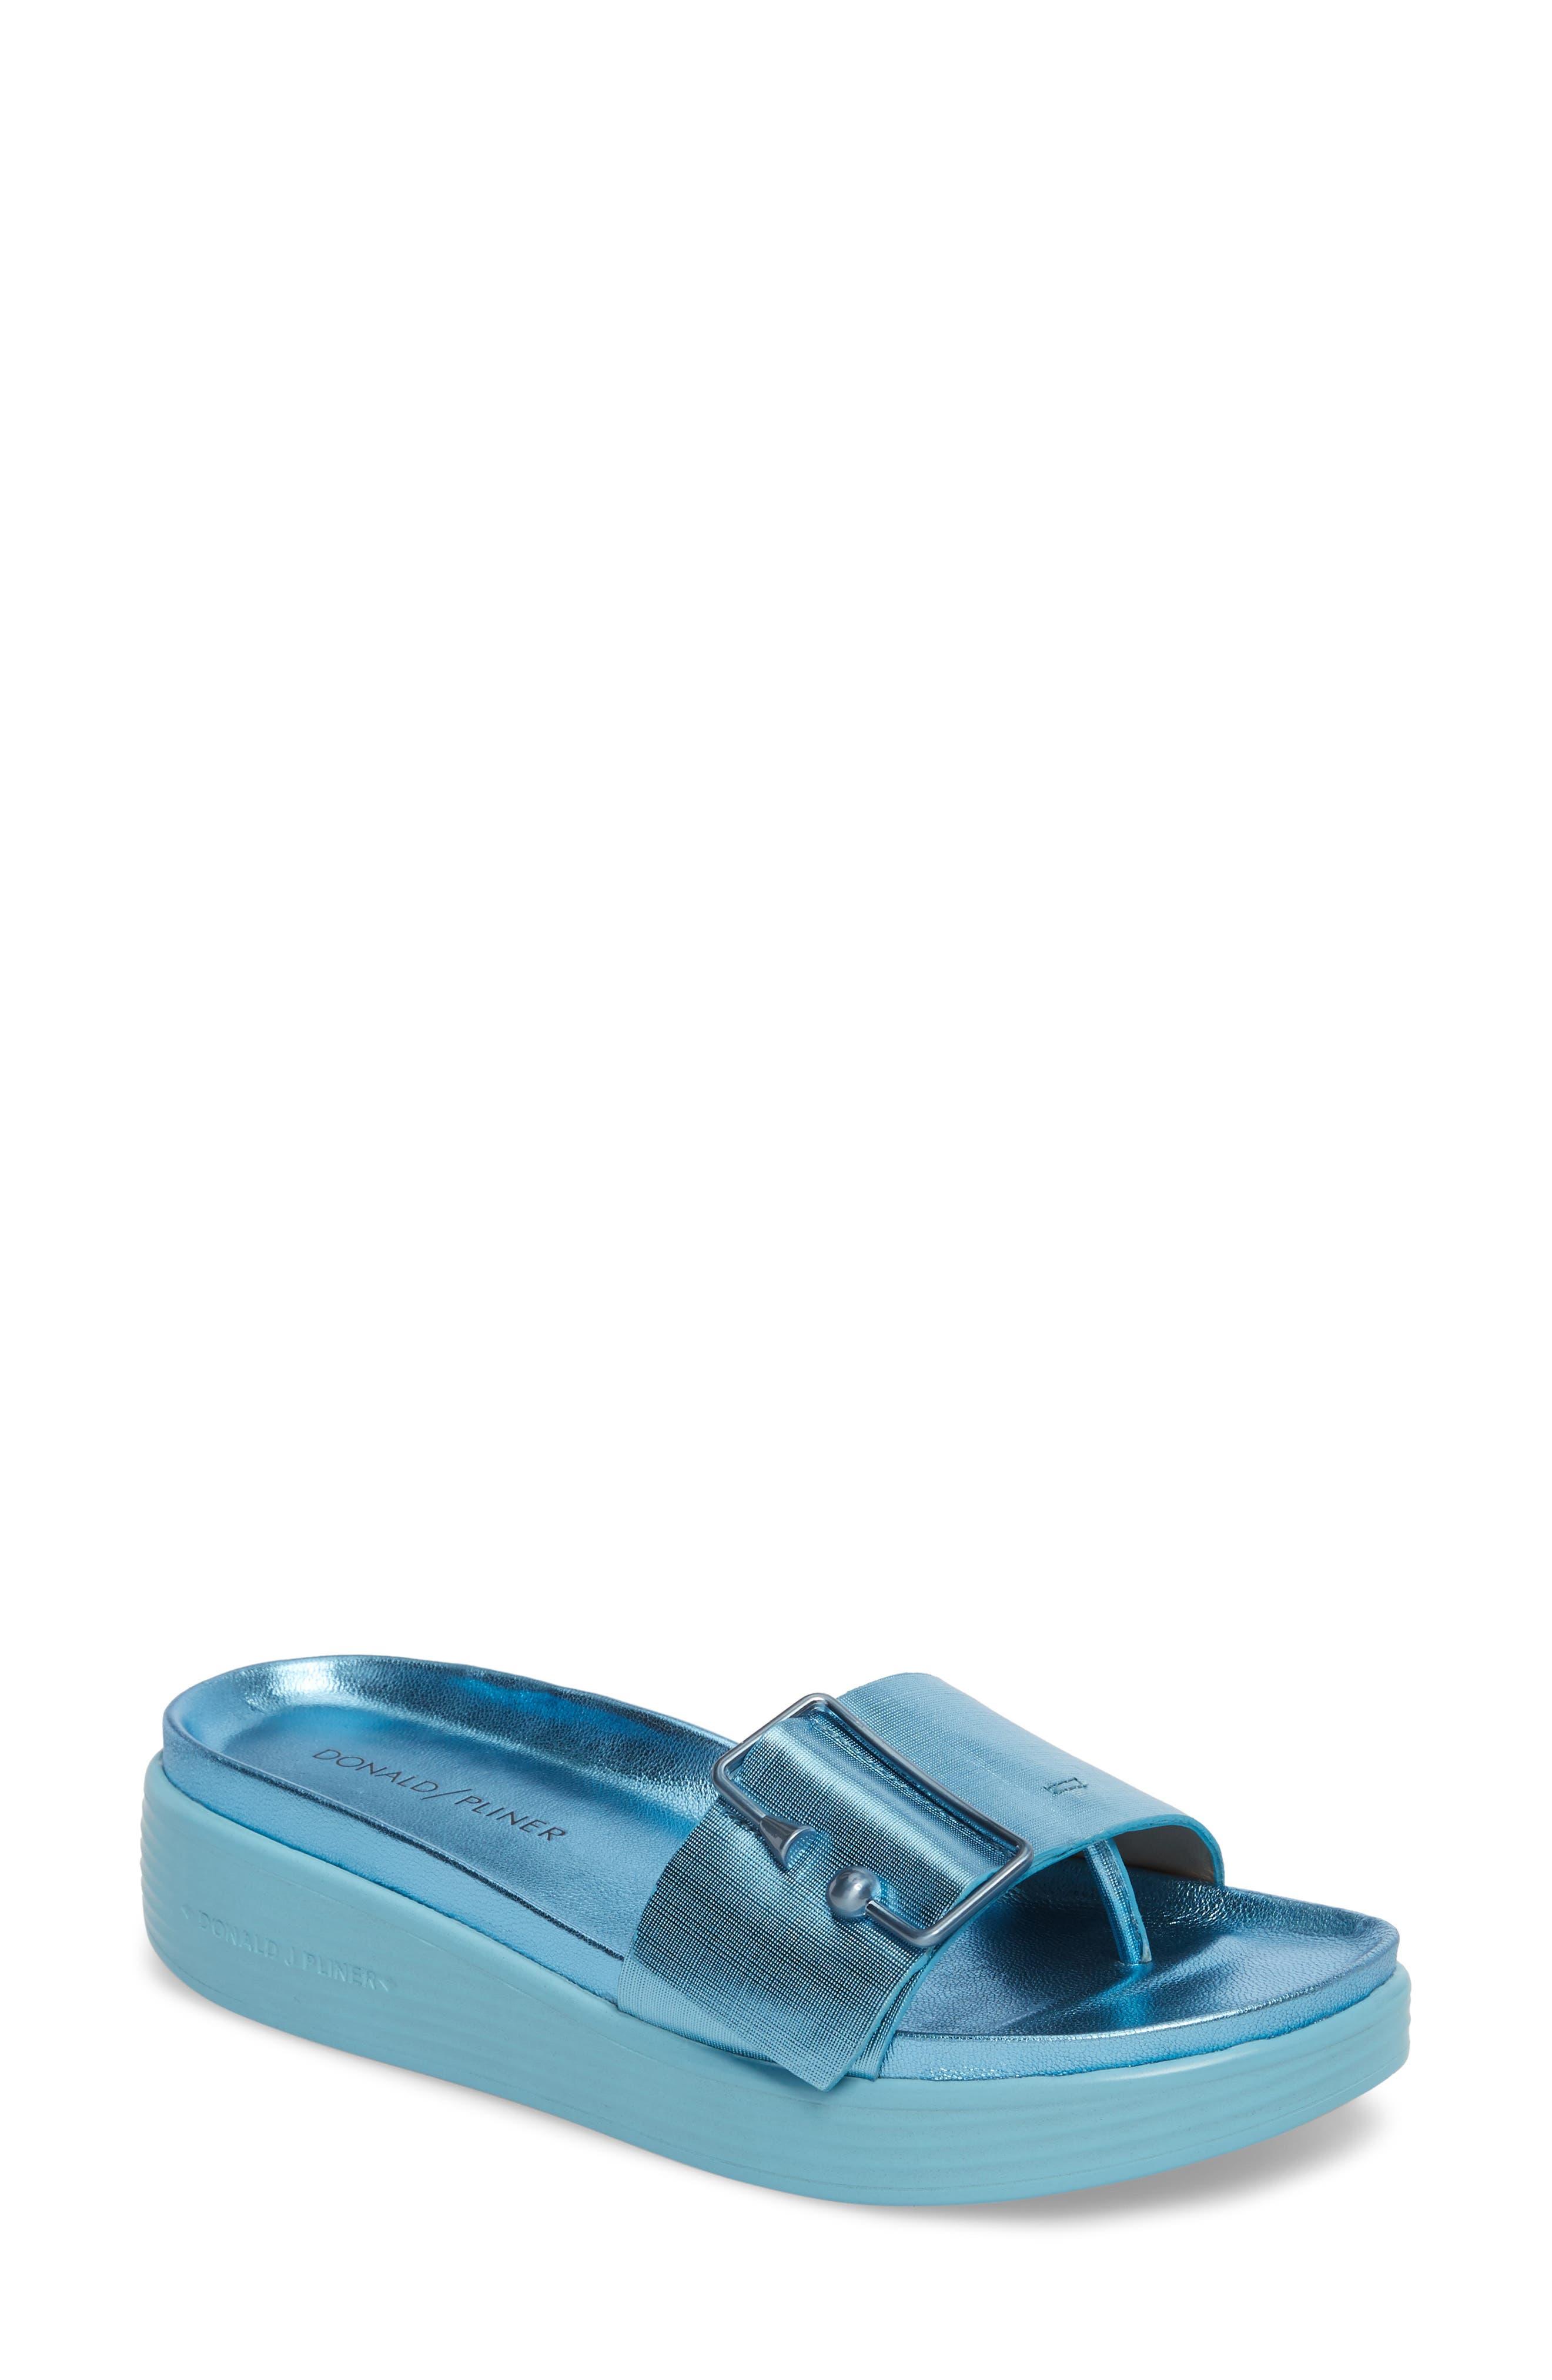 Main Image - Donald Pliner Fara Platform Slide Sandal (Women)